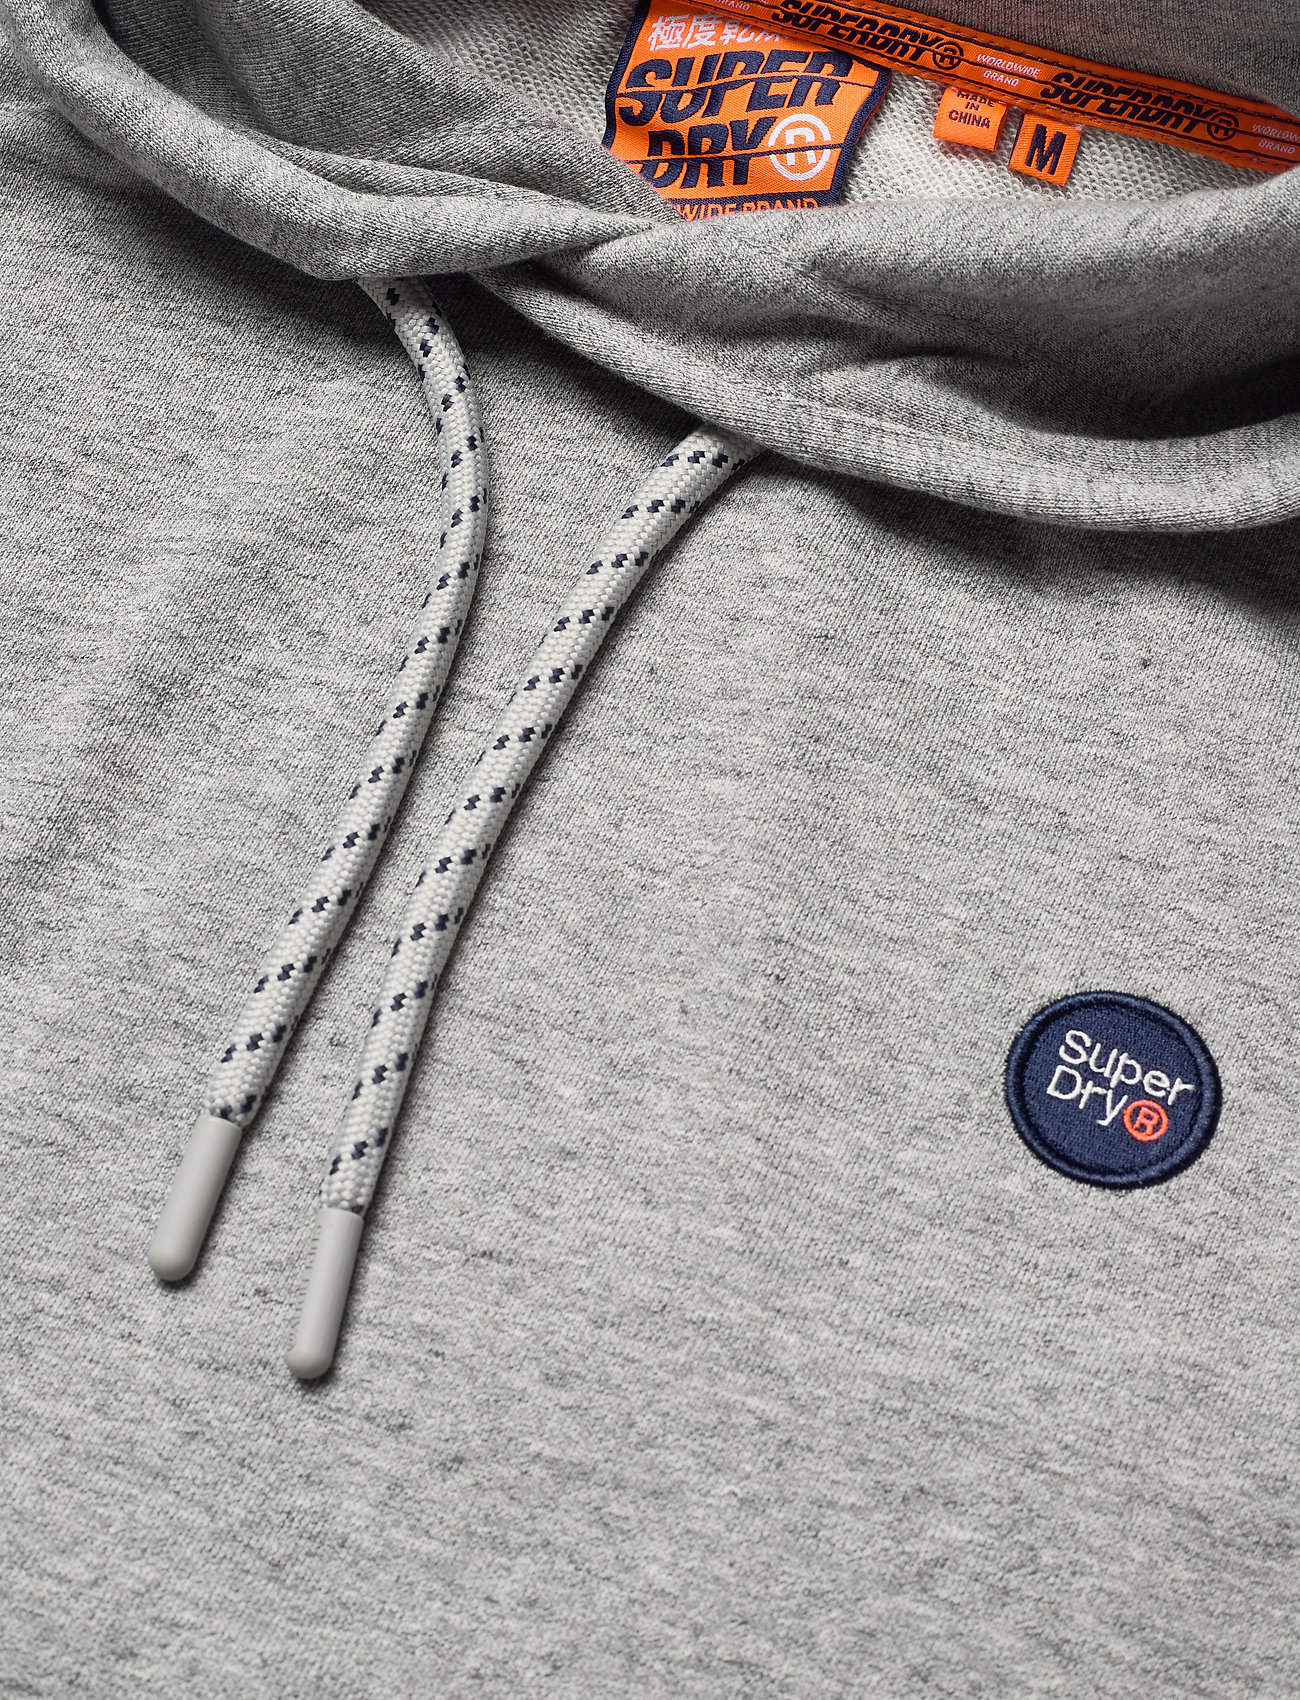 Superdry Collective Hood Ub - Sweatshirts COLLECTIVE DARK GREY GRIT - Menn Klær